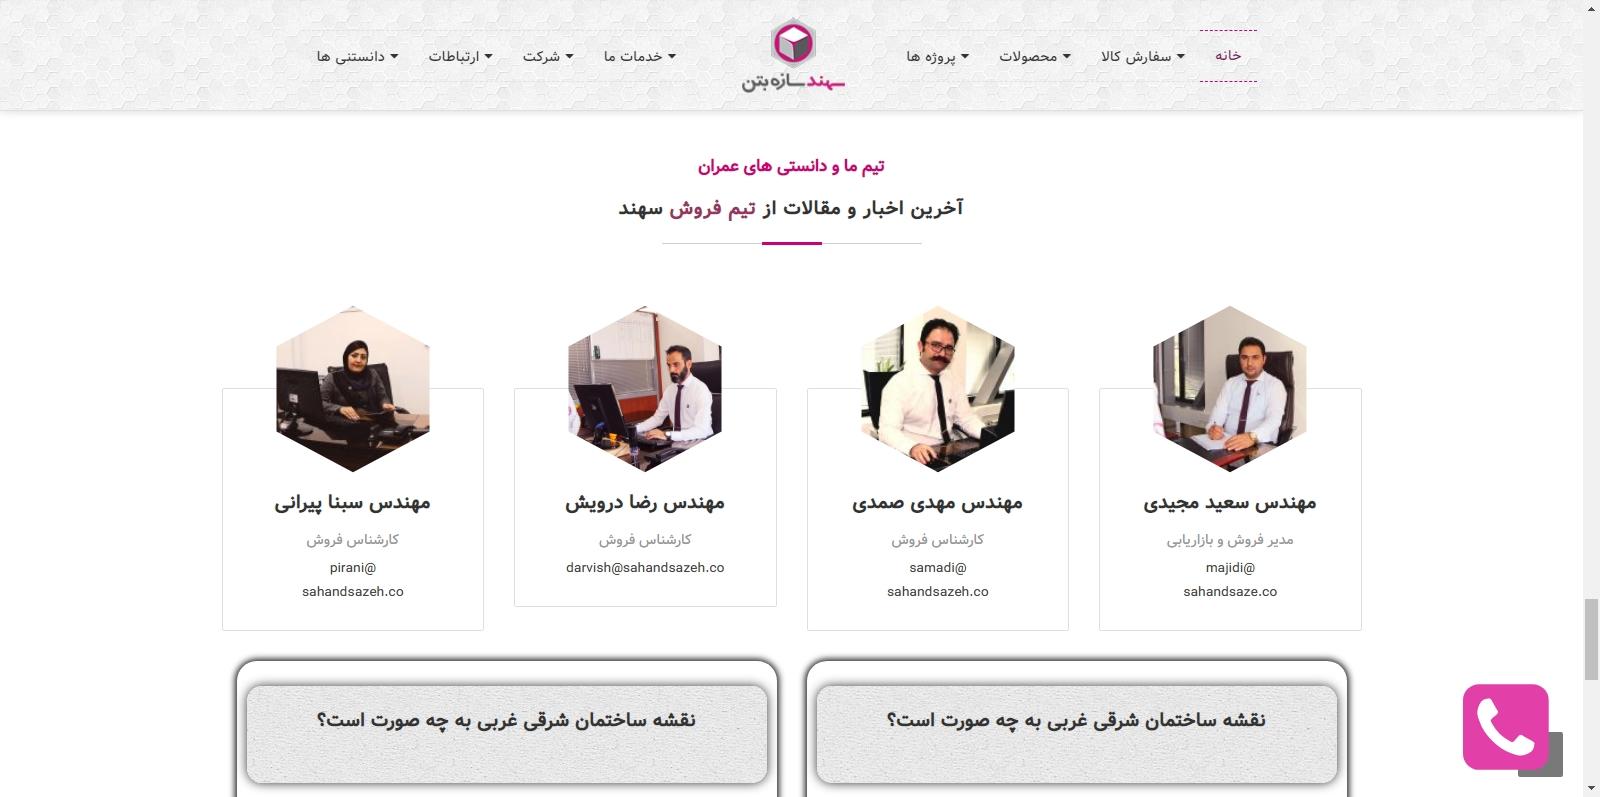 screenshot 20200525 214143 - sahandsazeh.co